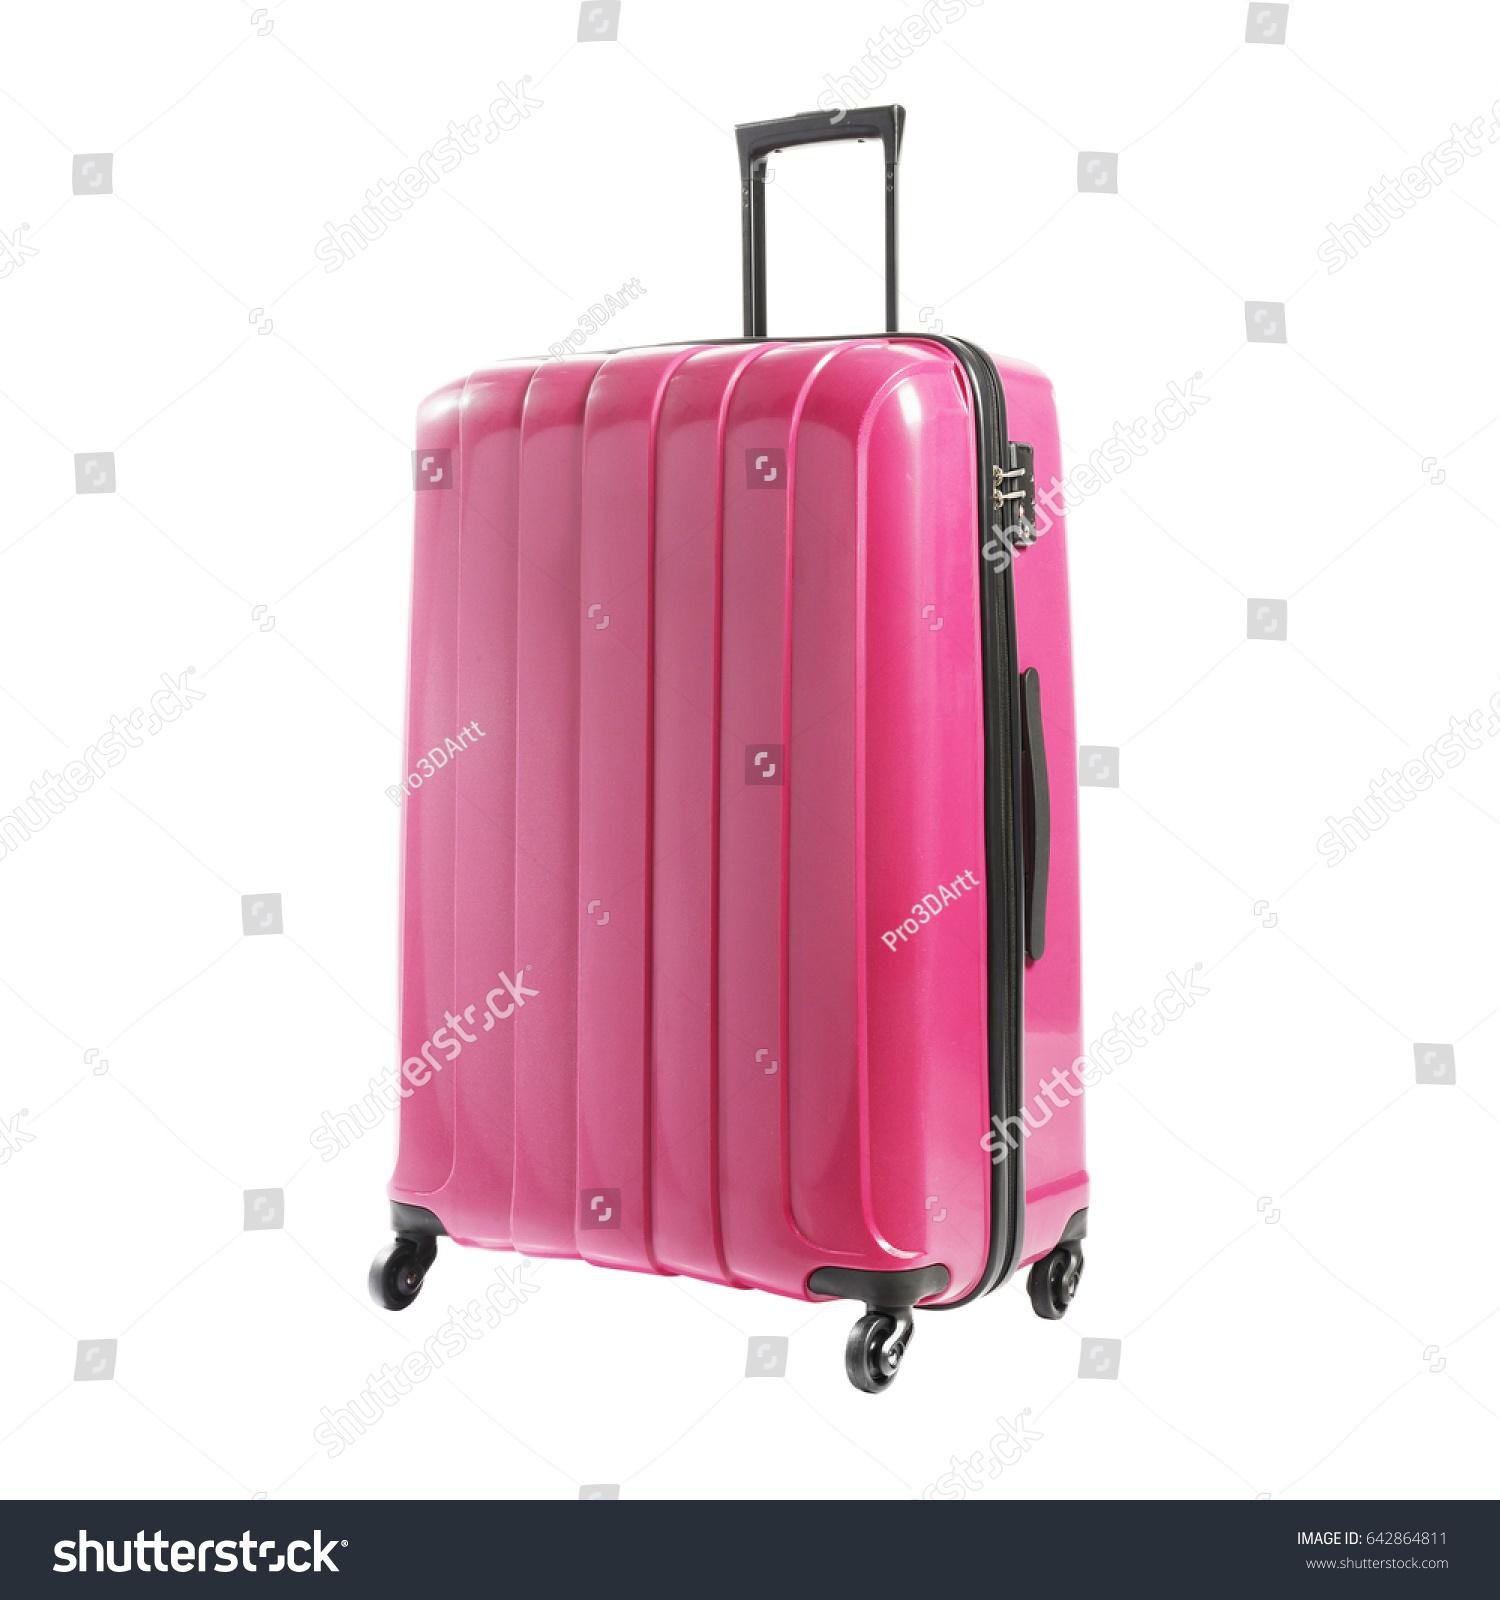 aa1035bd78 Bags - VIP Mazda PP 4W 55 cm Cabin Trolley Bag Wholesaler .